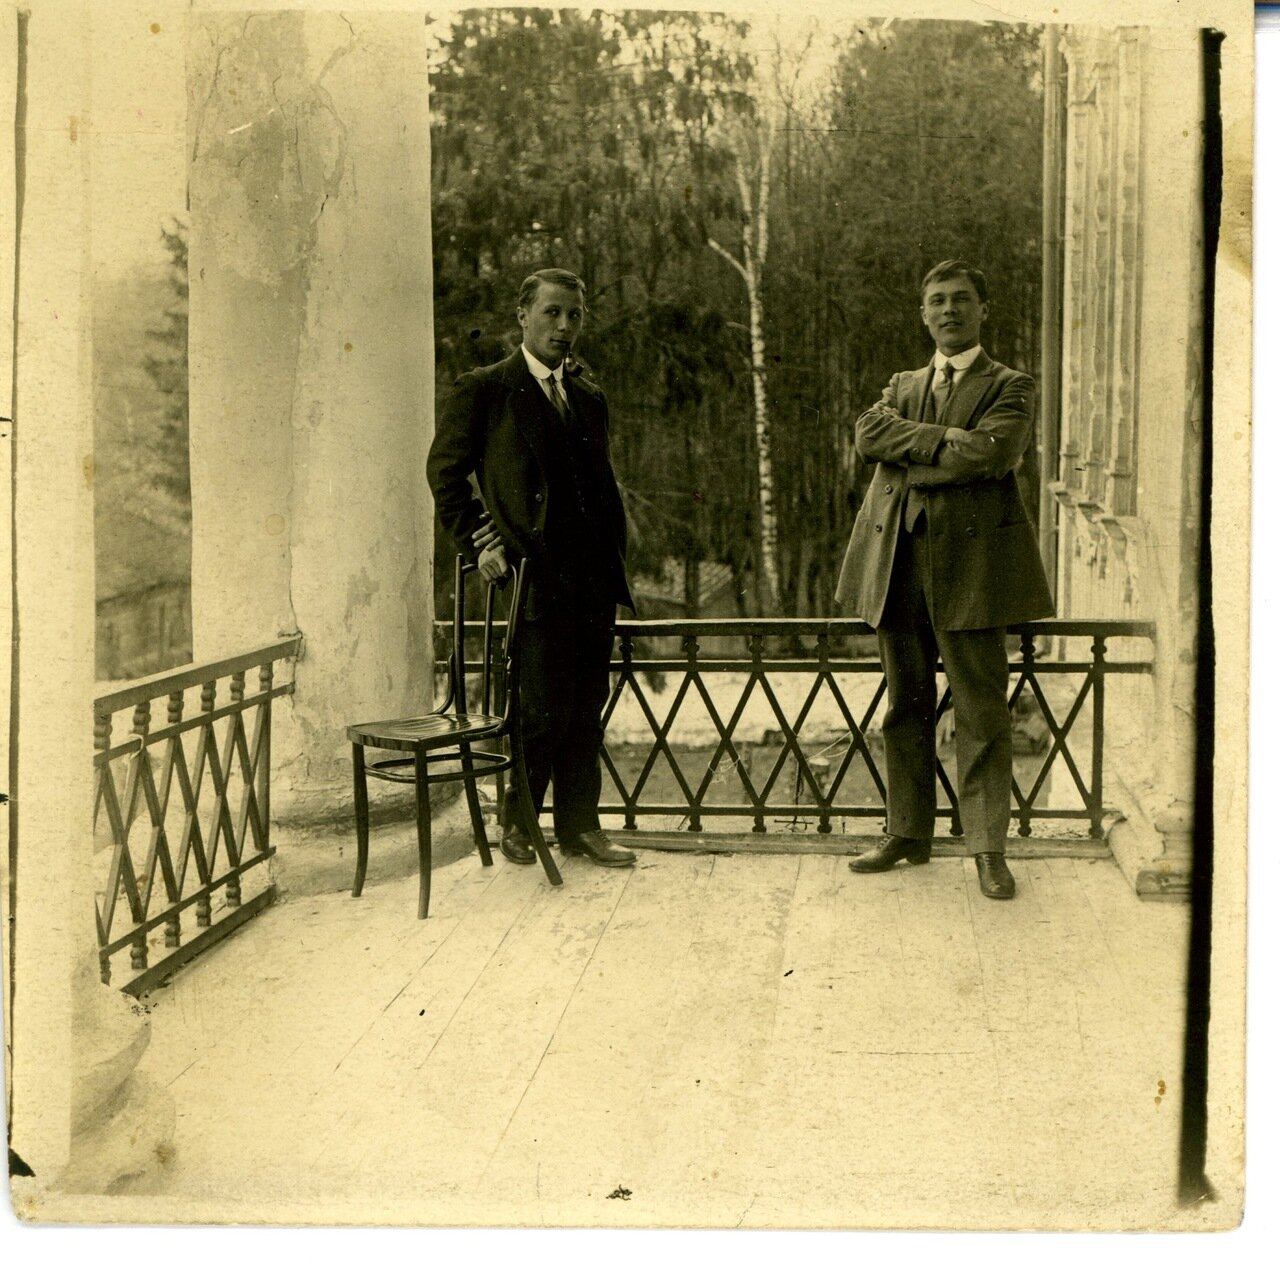 1910. Константин и Александр Сергеевич Барановы